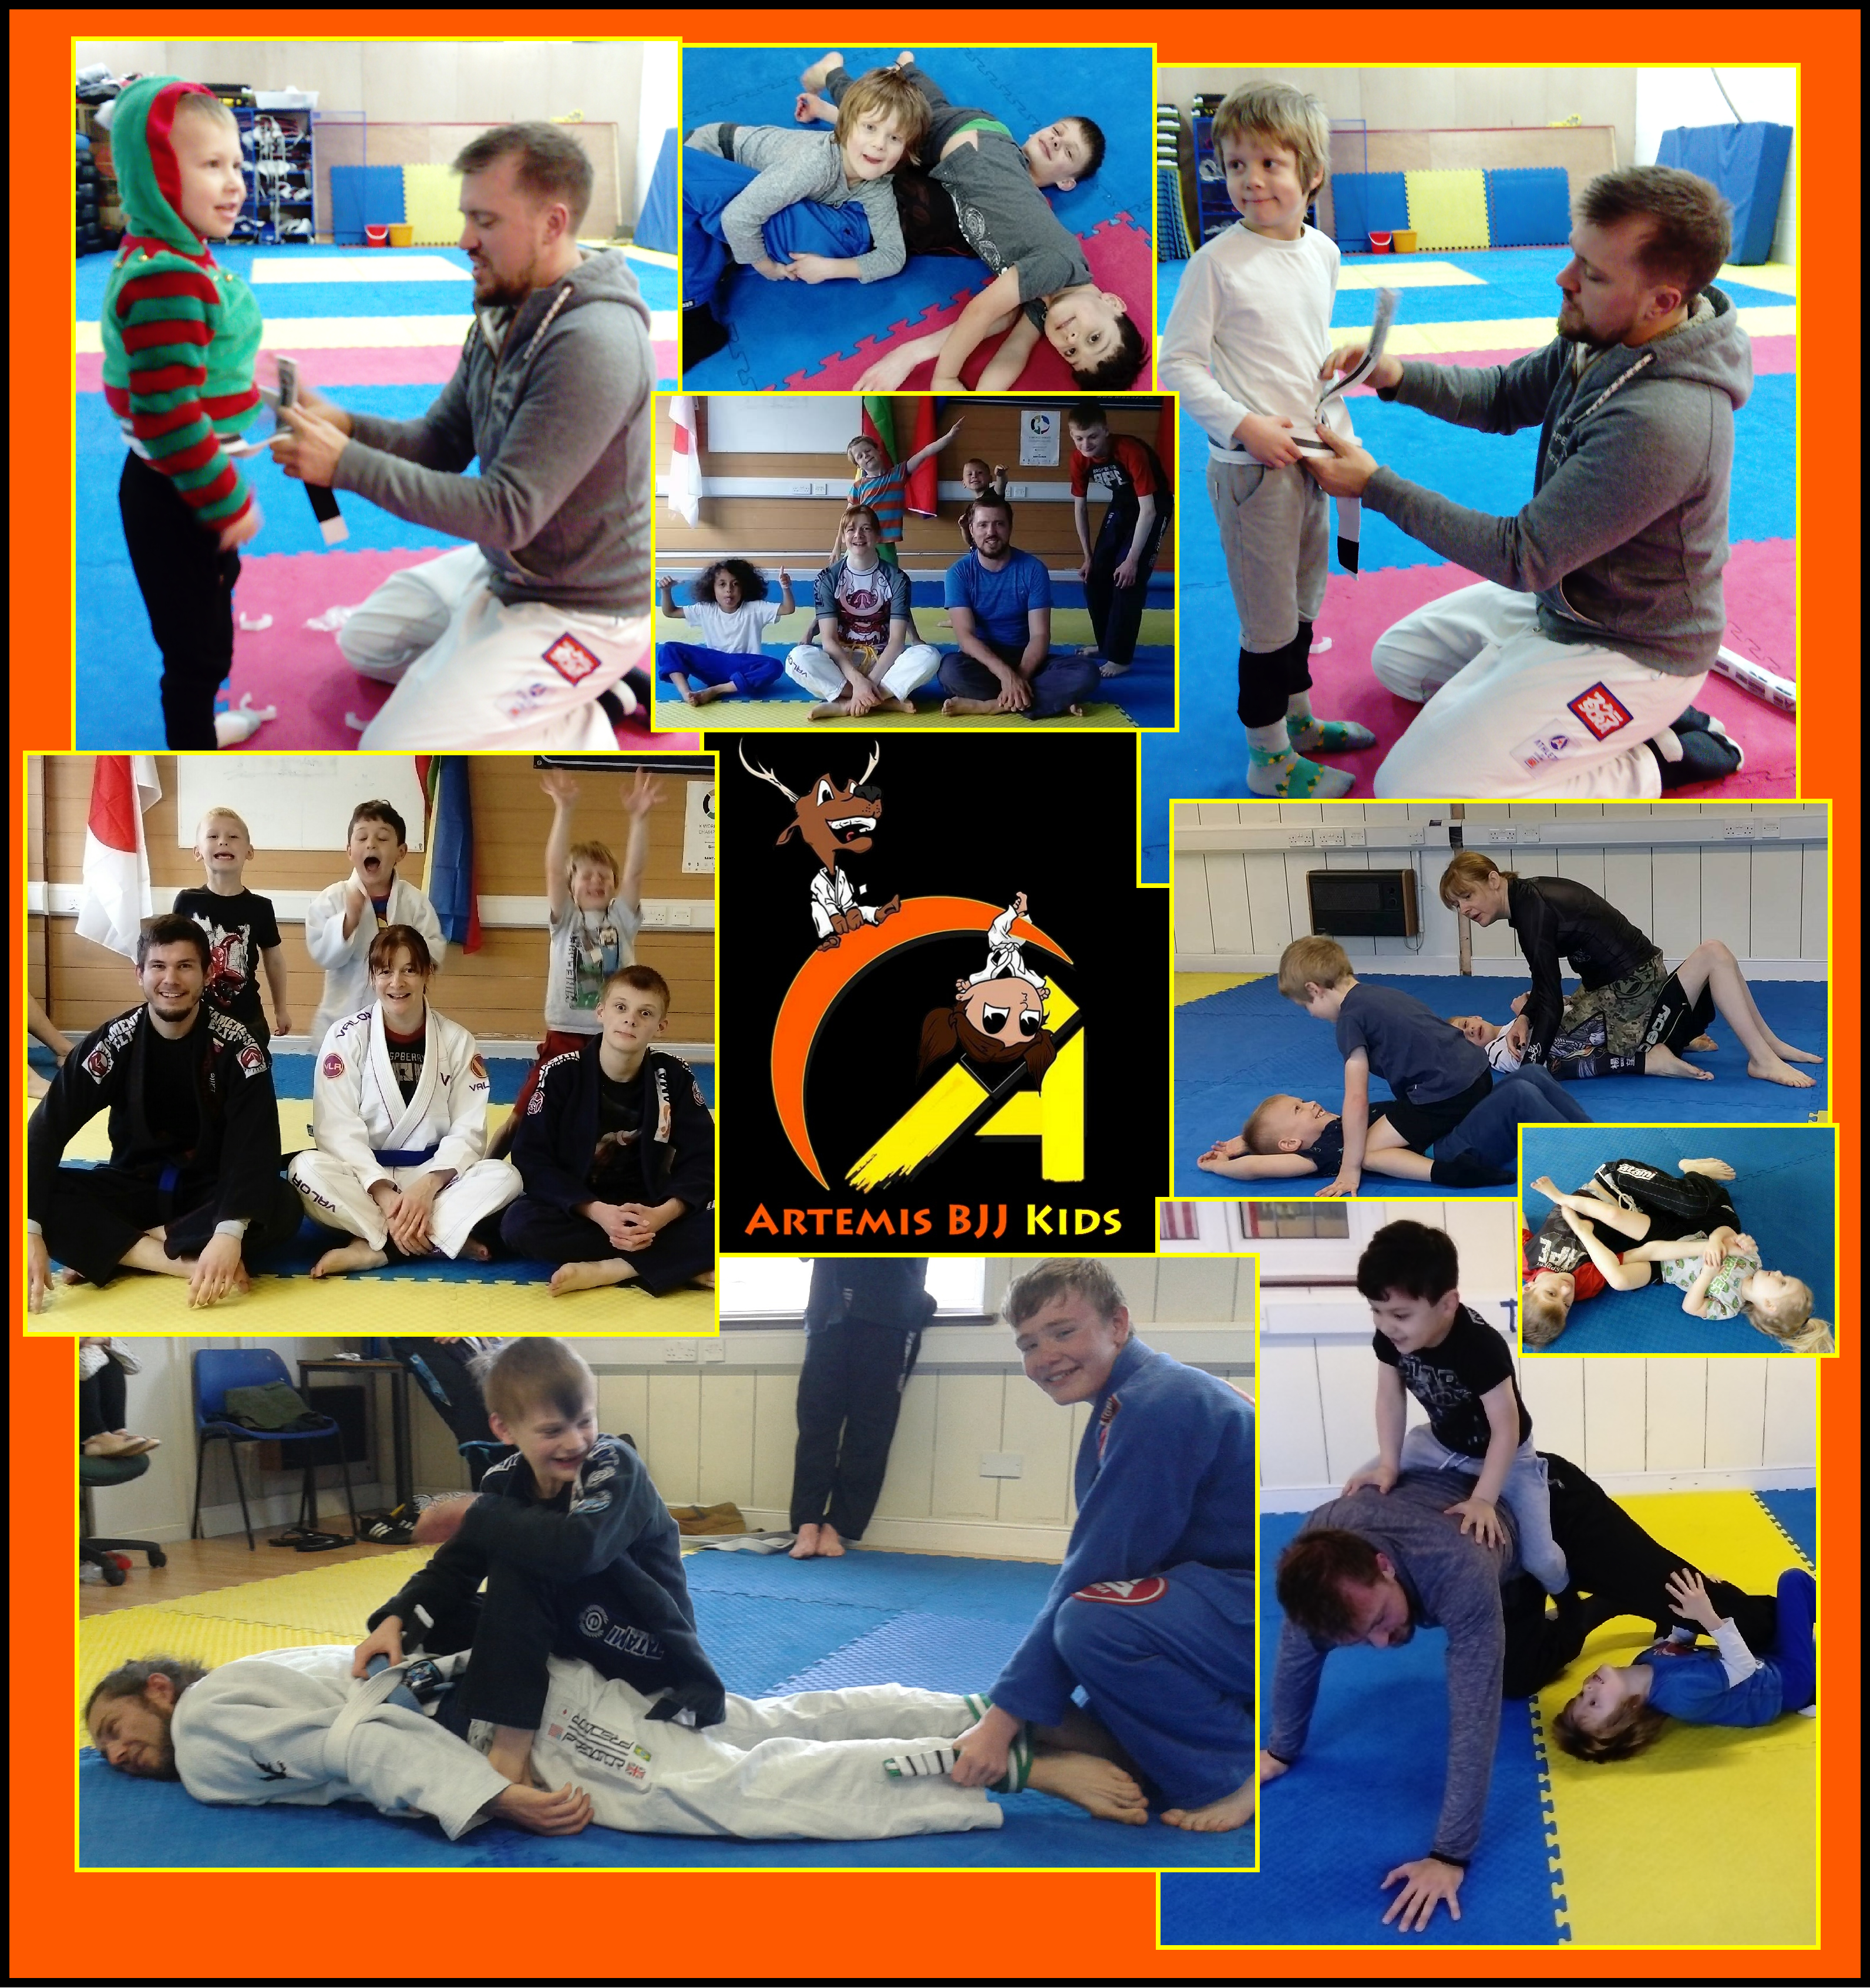 Artemis BJJ kids Brazilian jiu jitsu Bristol children martial arts